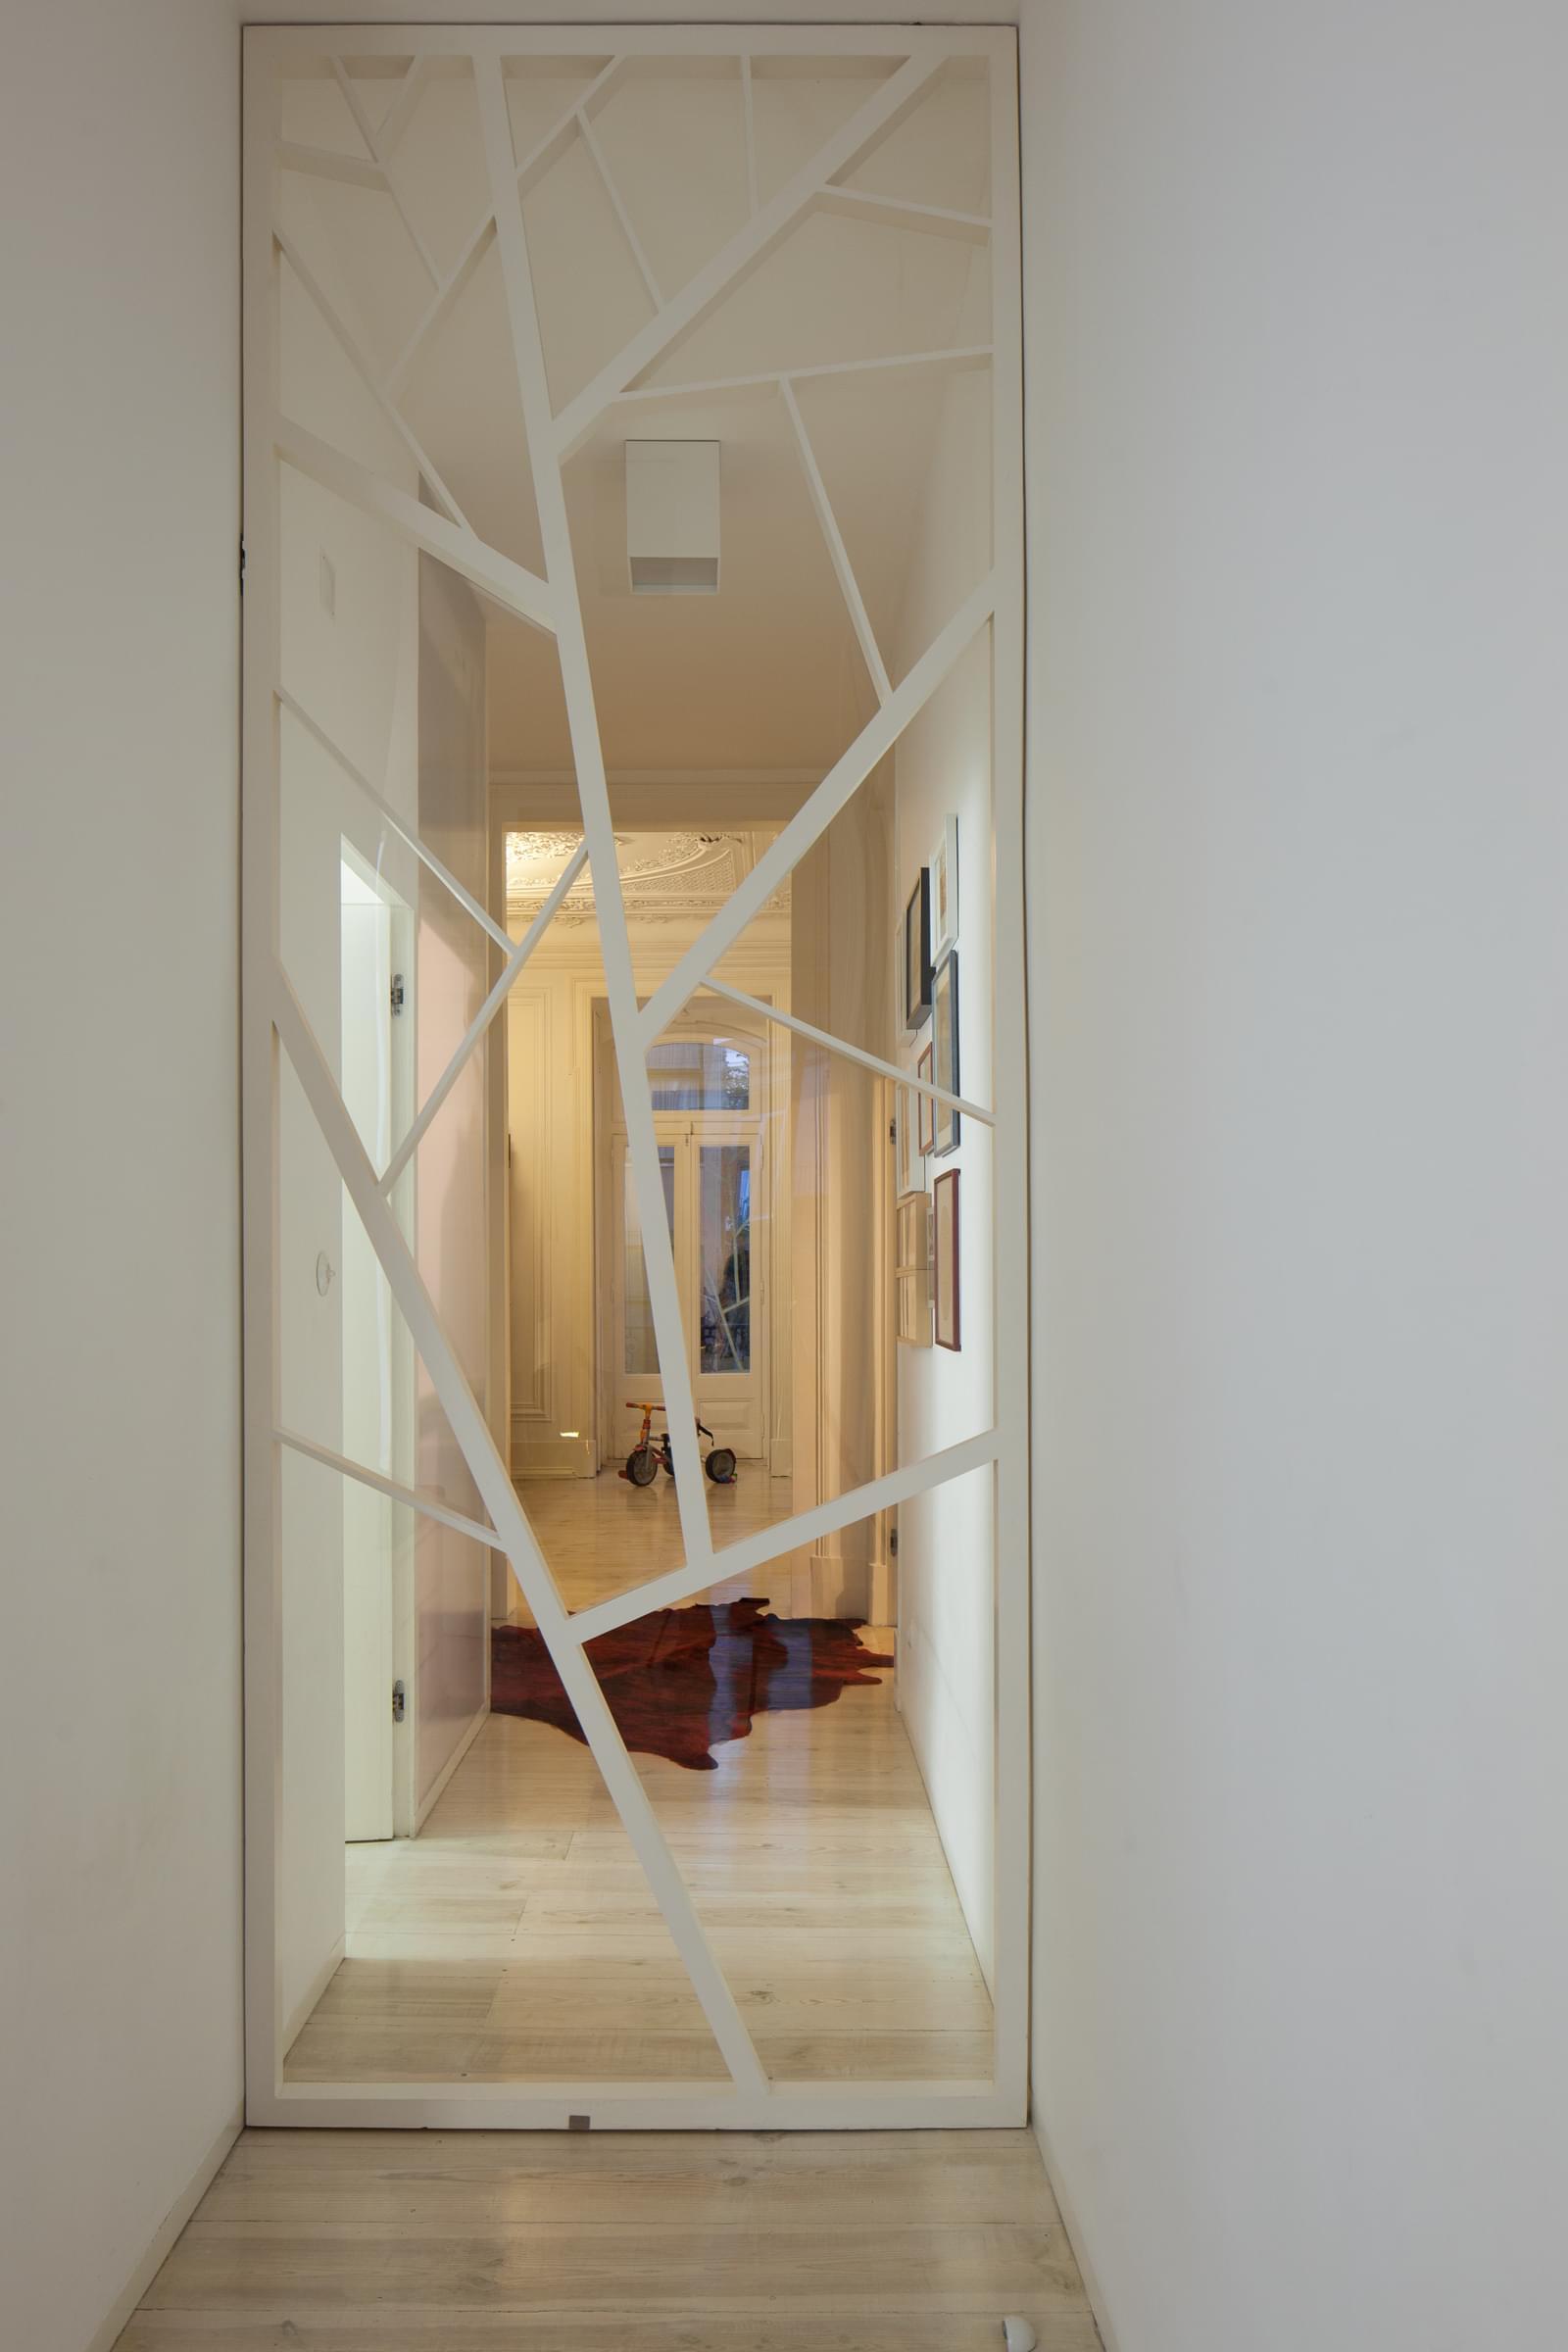 pf17588-apartamento-t4-1-lisboa-a37f711d-2e00-422a-985b-08232a3caccc